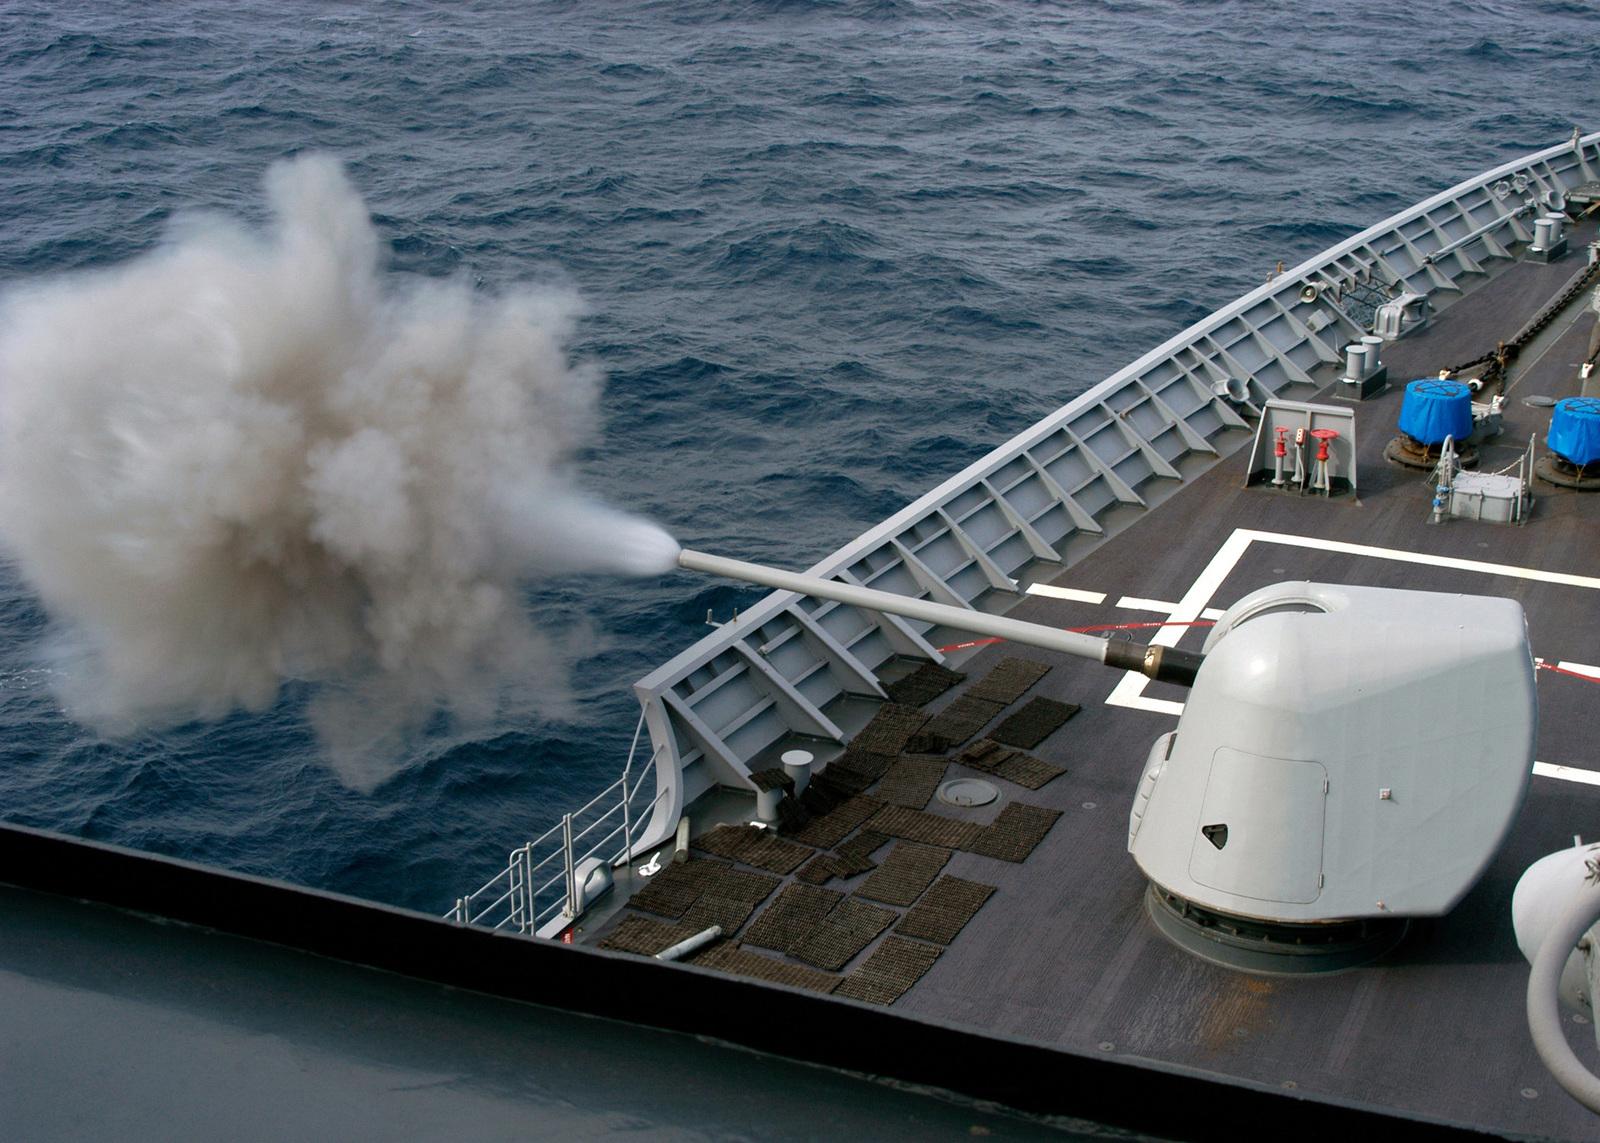 defeating cruise missiles air power australia - HD1600×1143